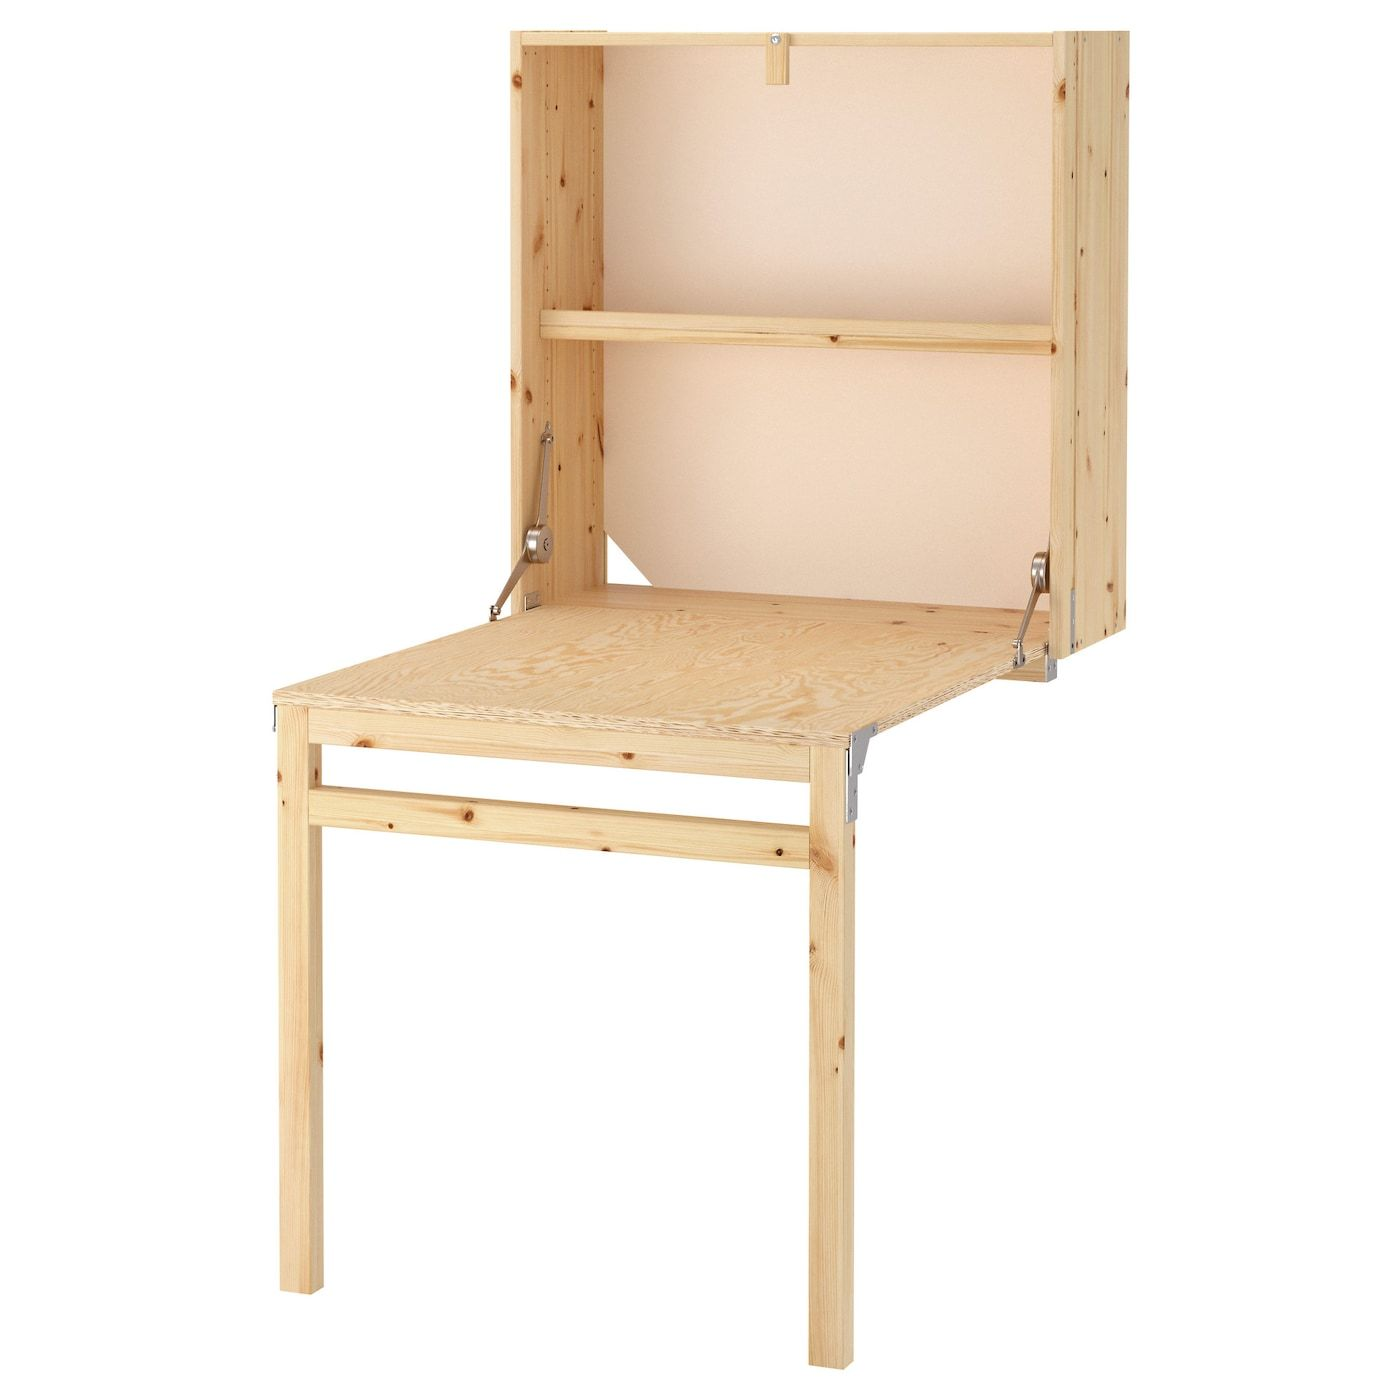 Ivar Storage Unit With Foldable Table Pine Ikea In 2020 Foldable Table Ikea Ikea Ivar